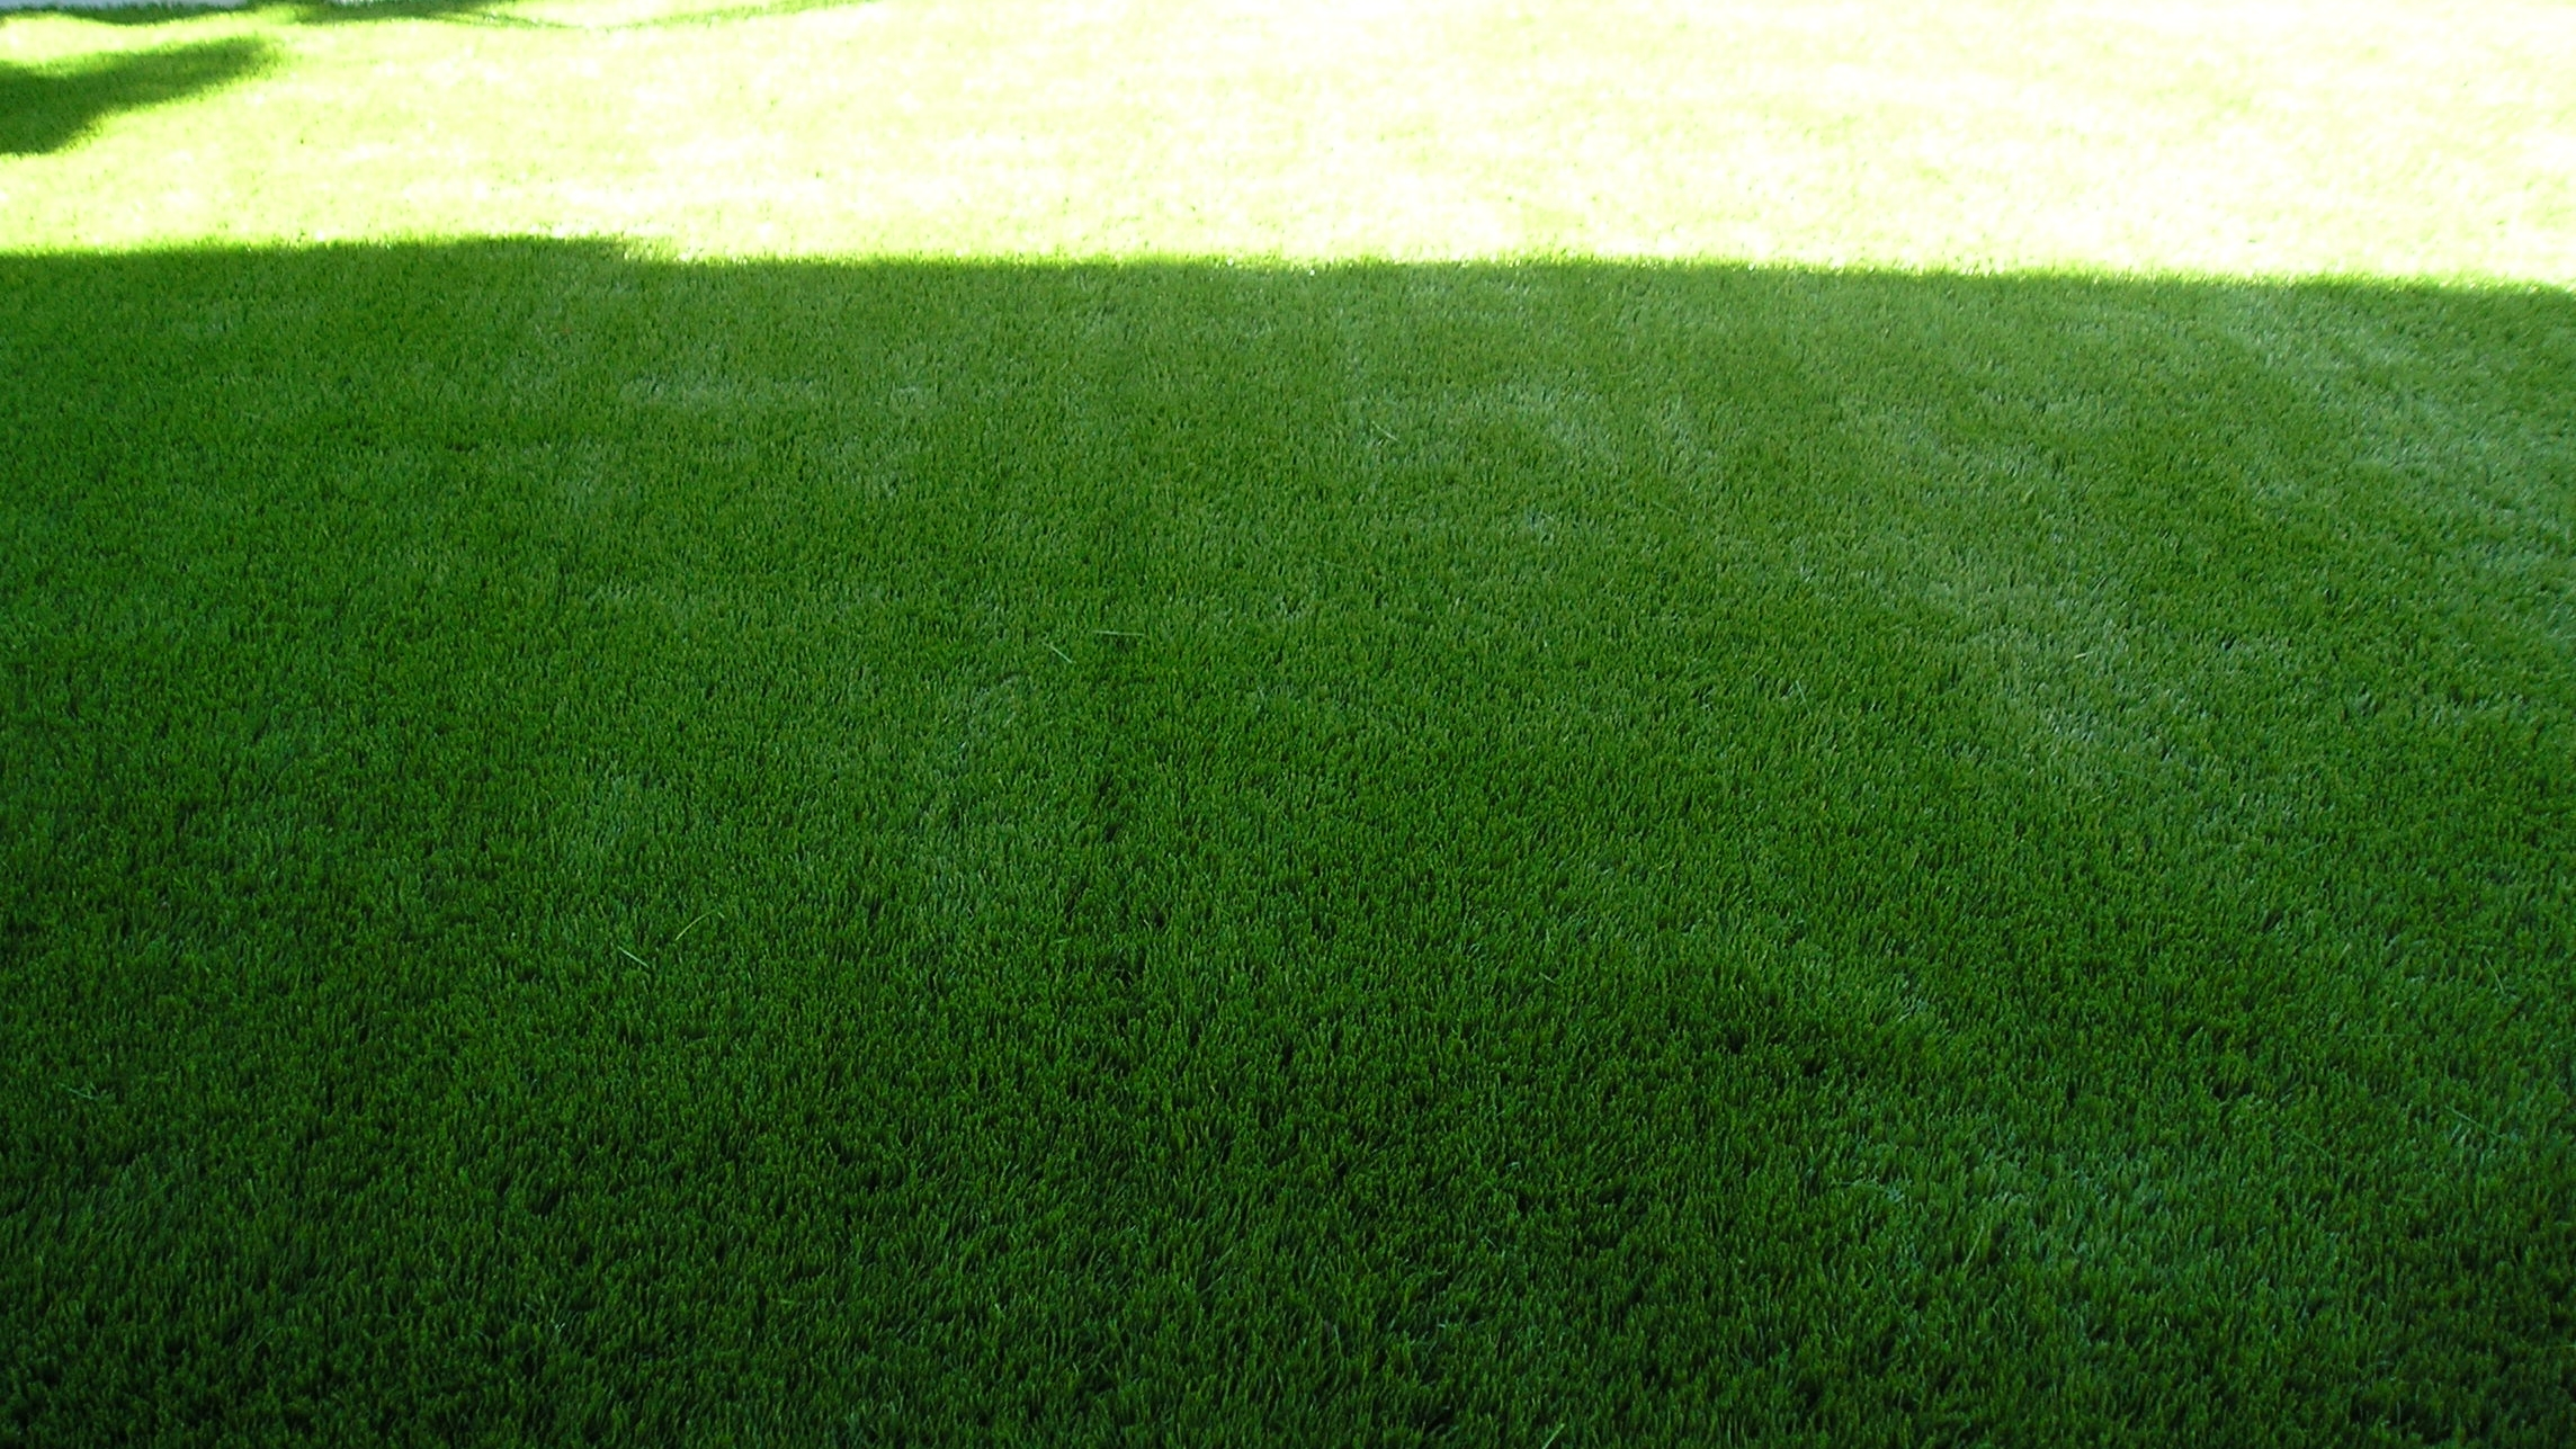 Super Natural 60 fake grass,fake grass for yard,fake lawn,fake grass carpet,fake turf,artificial grass,fake grass,synthetic grass,grass carpet,artificial grass rug